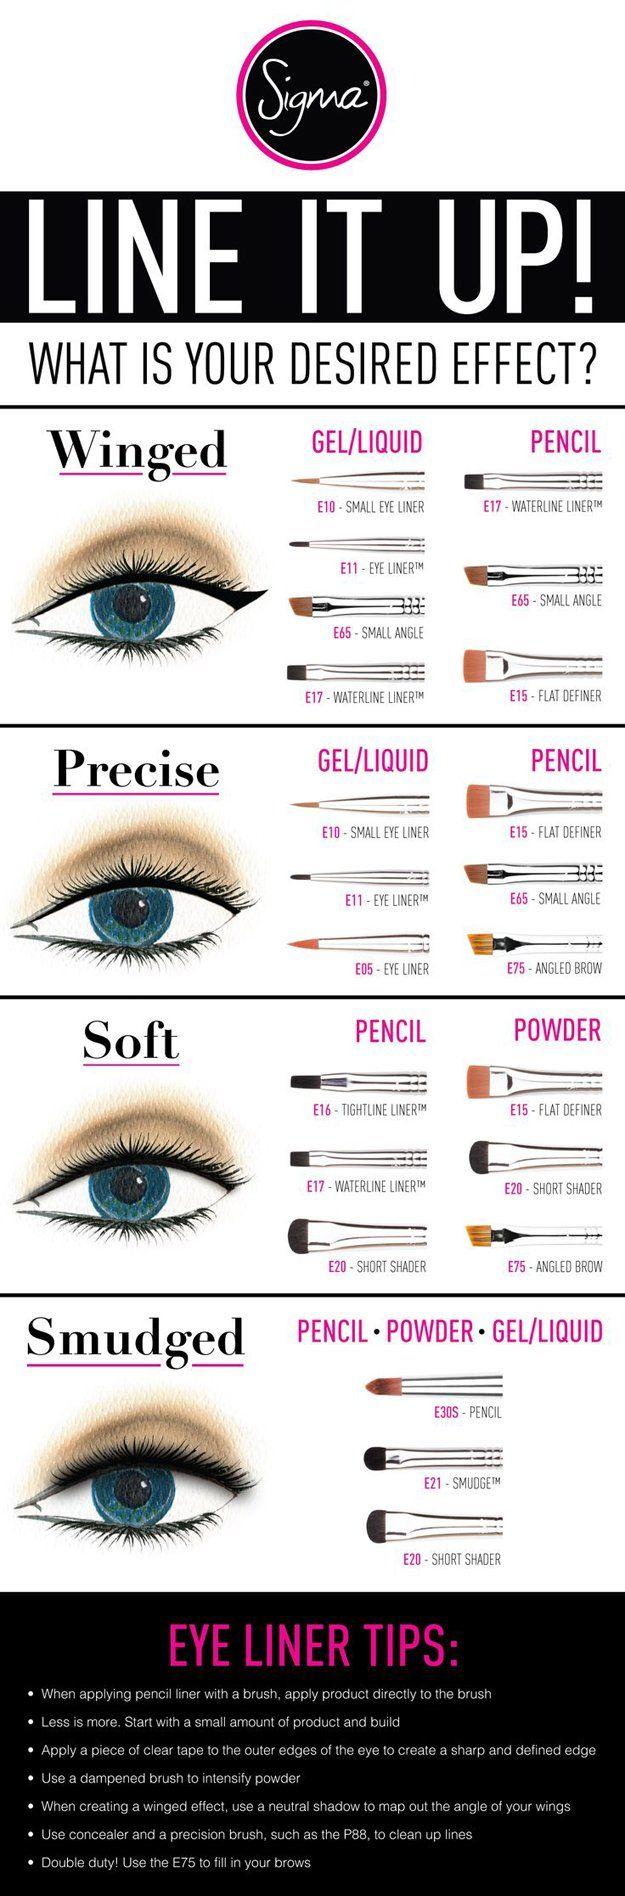 perfect eyeliner application